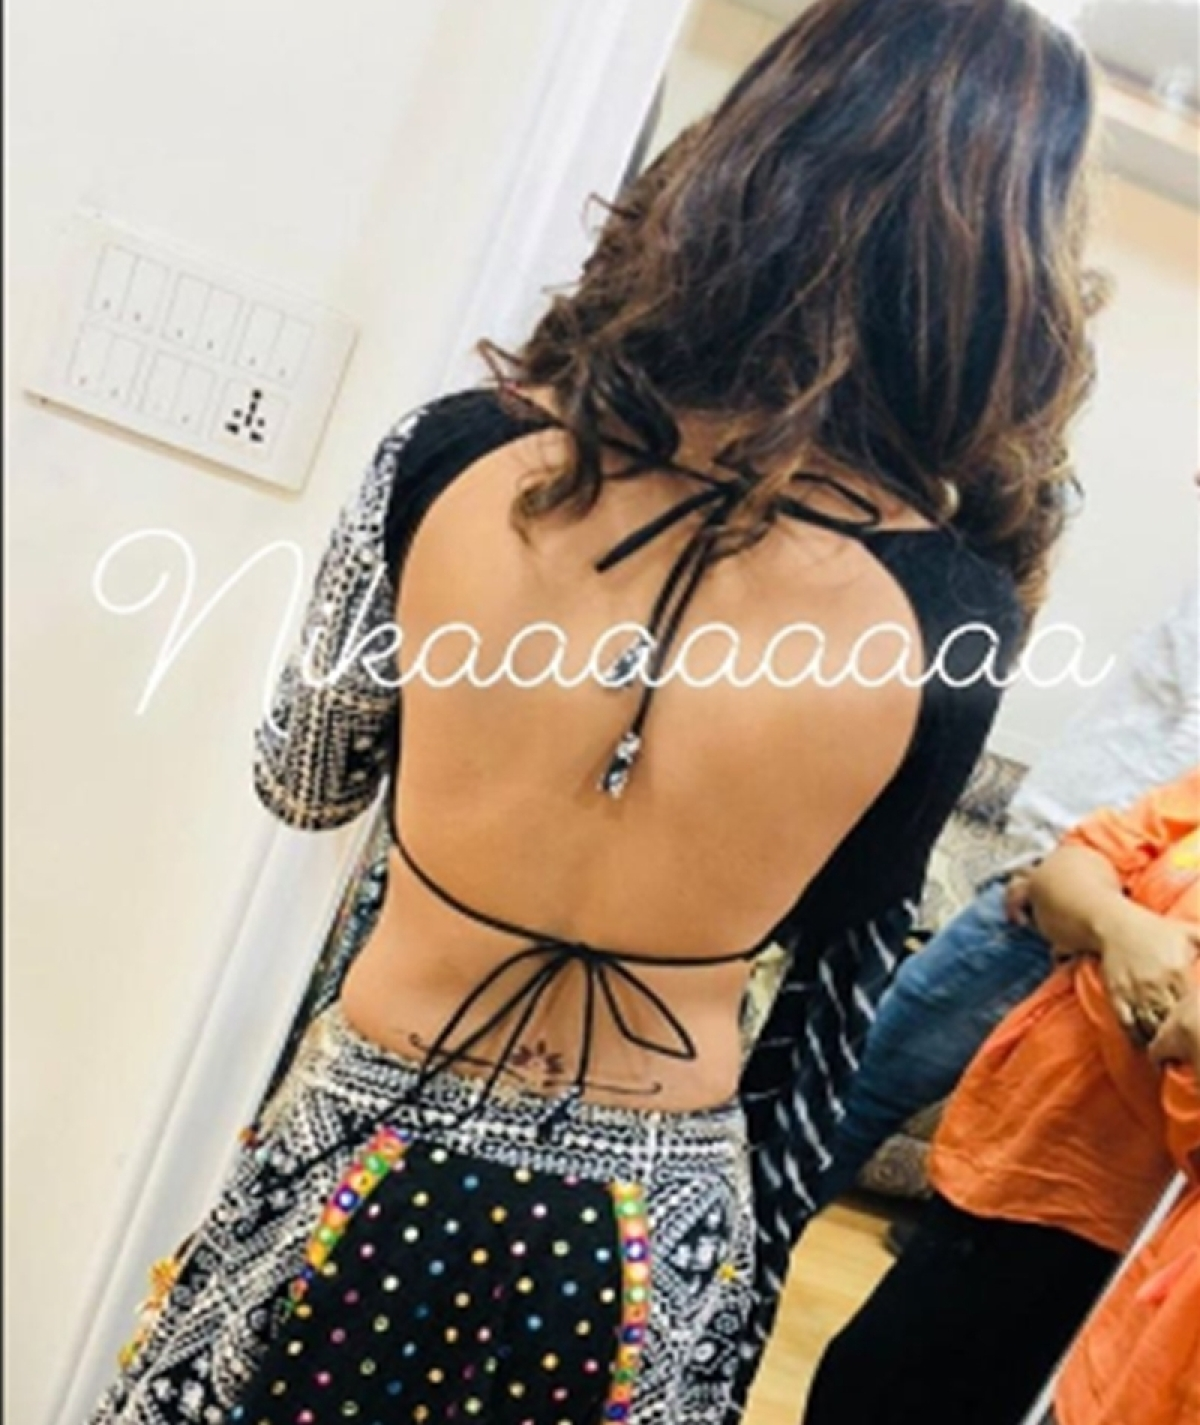 Kasautii Zindagii Kay 2: Hina Khan or Krystle D'souza? New Komolika in a backless choli is all about nakhra